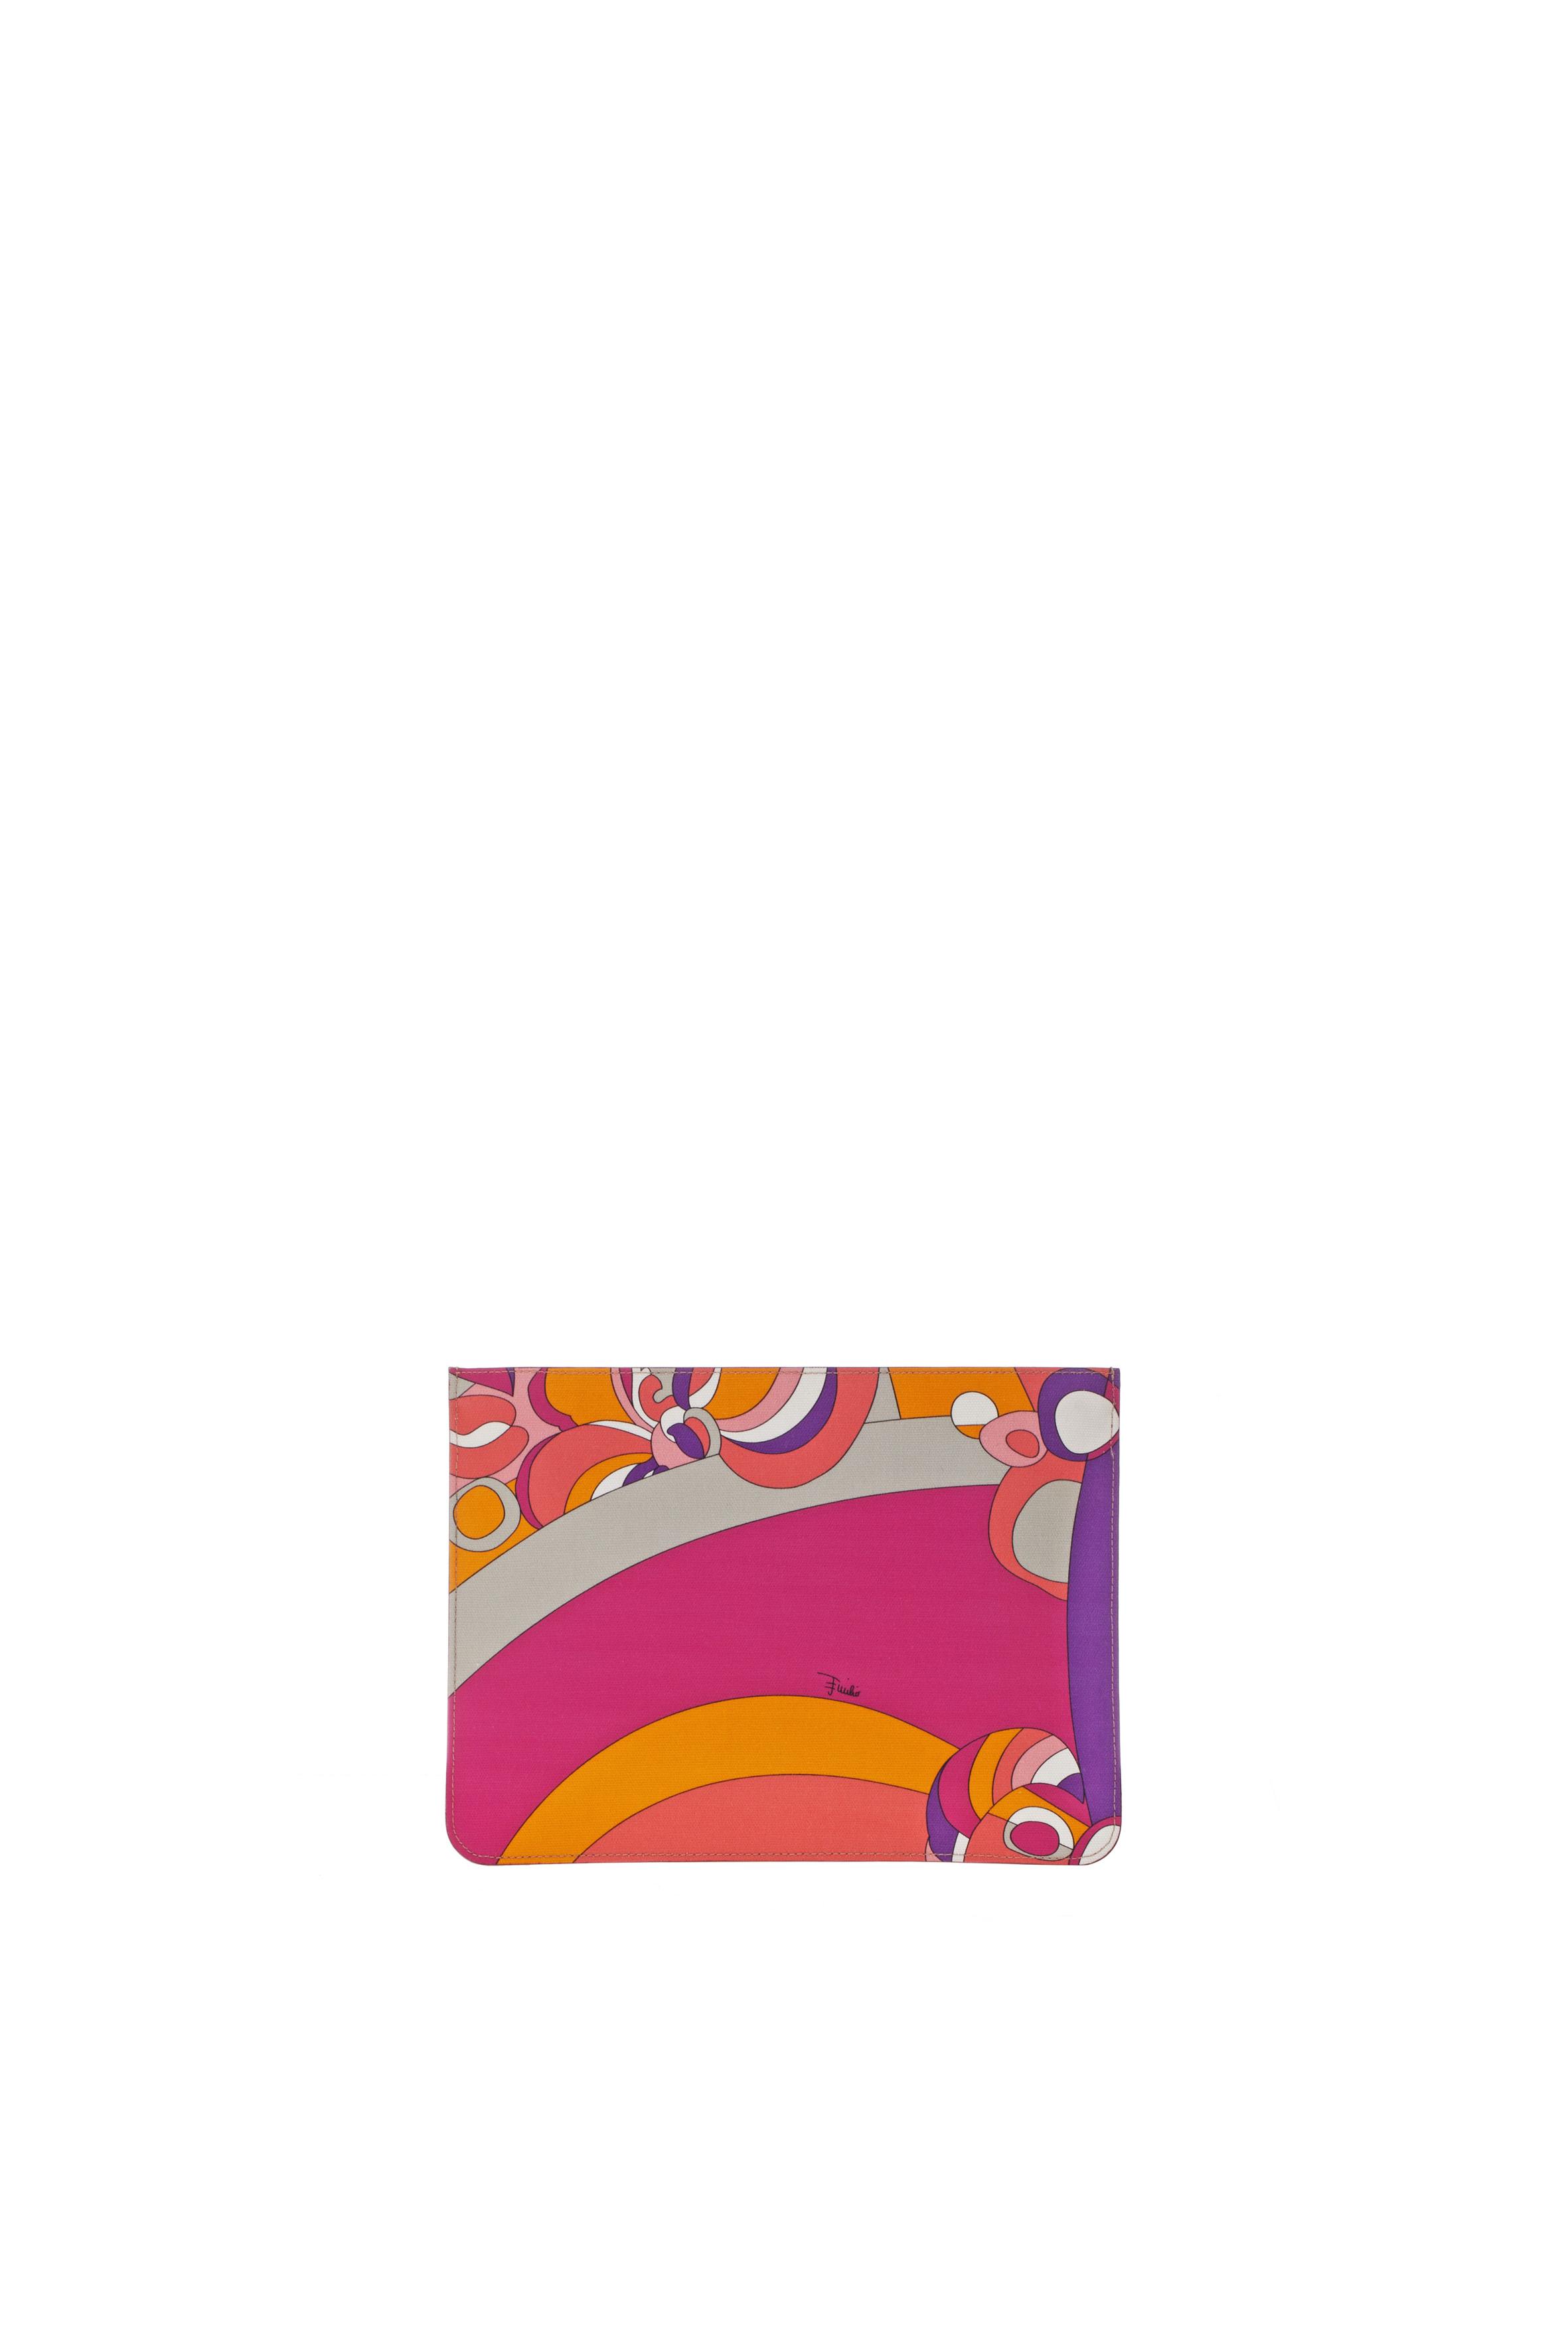 Emilio Pucci_Resort 2015 Collection_26